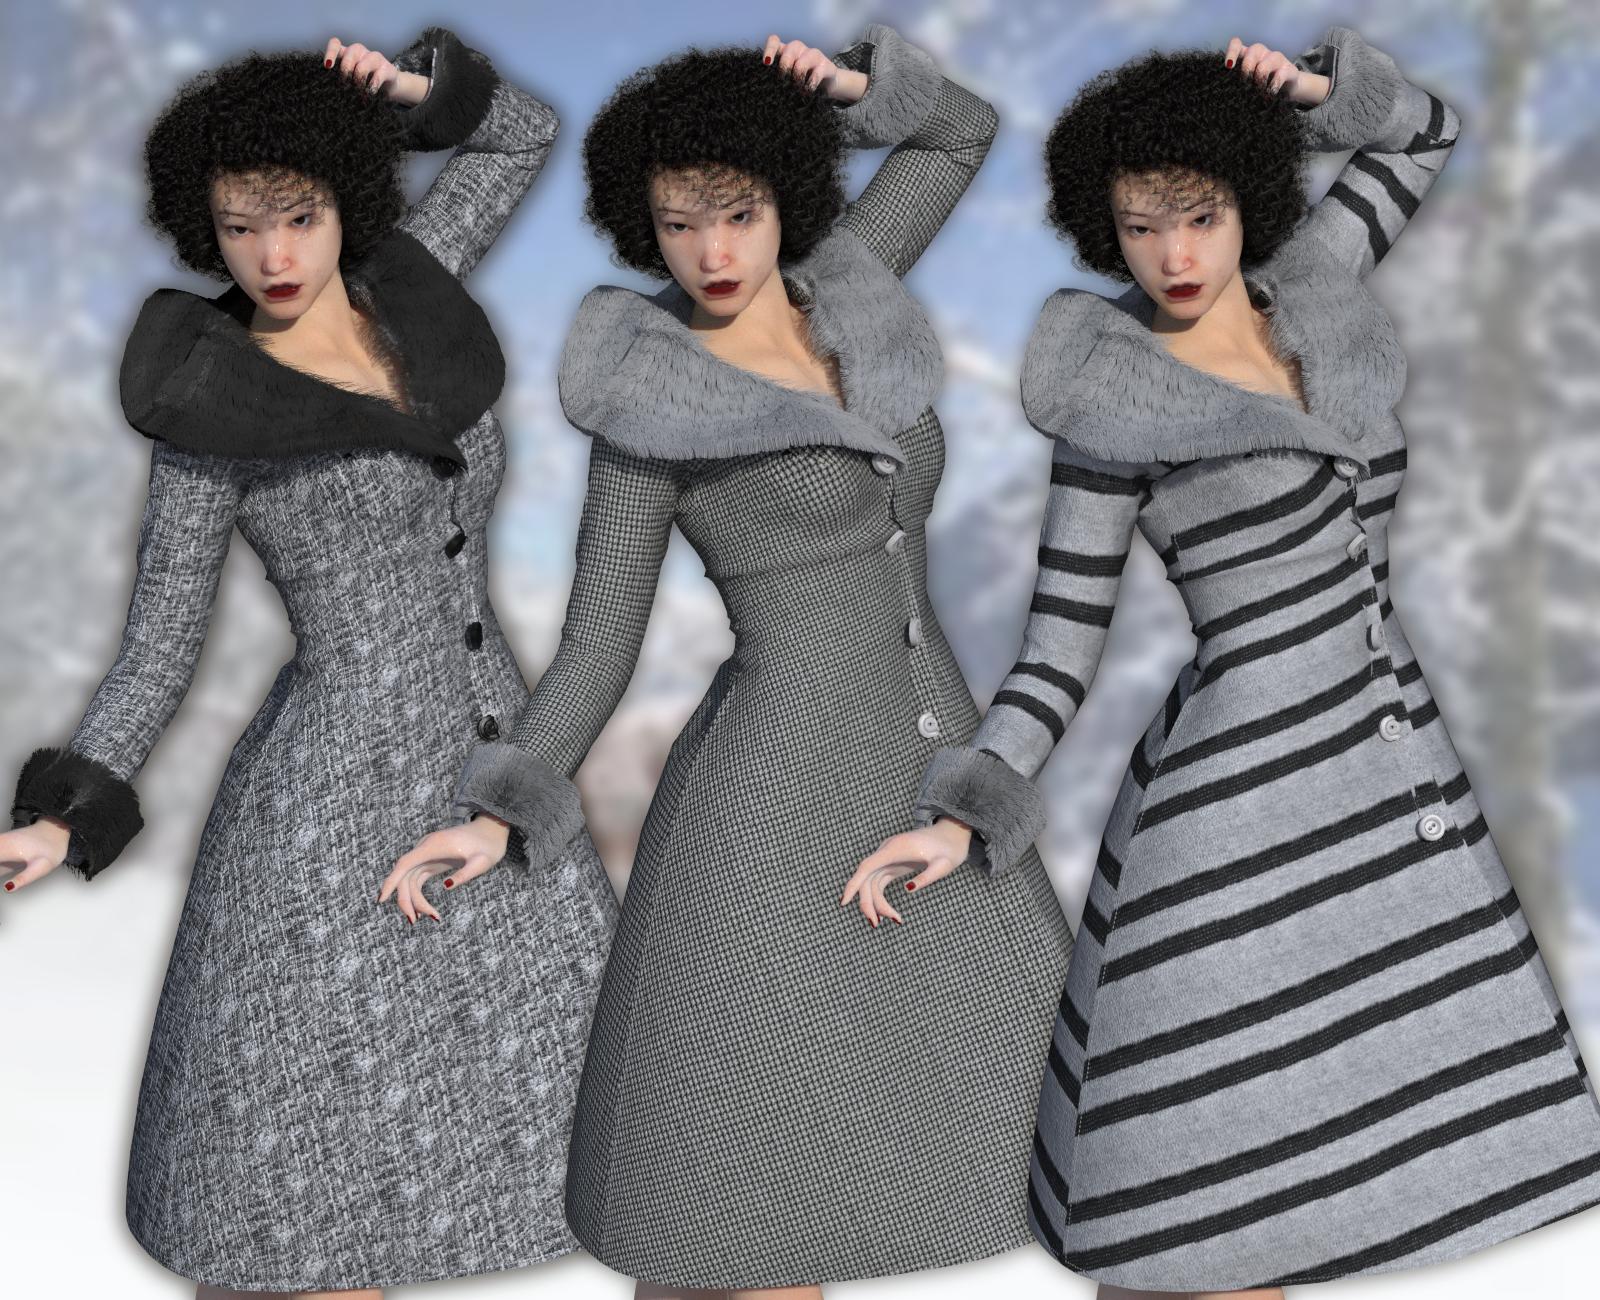 Wintercoat promo7